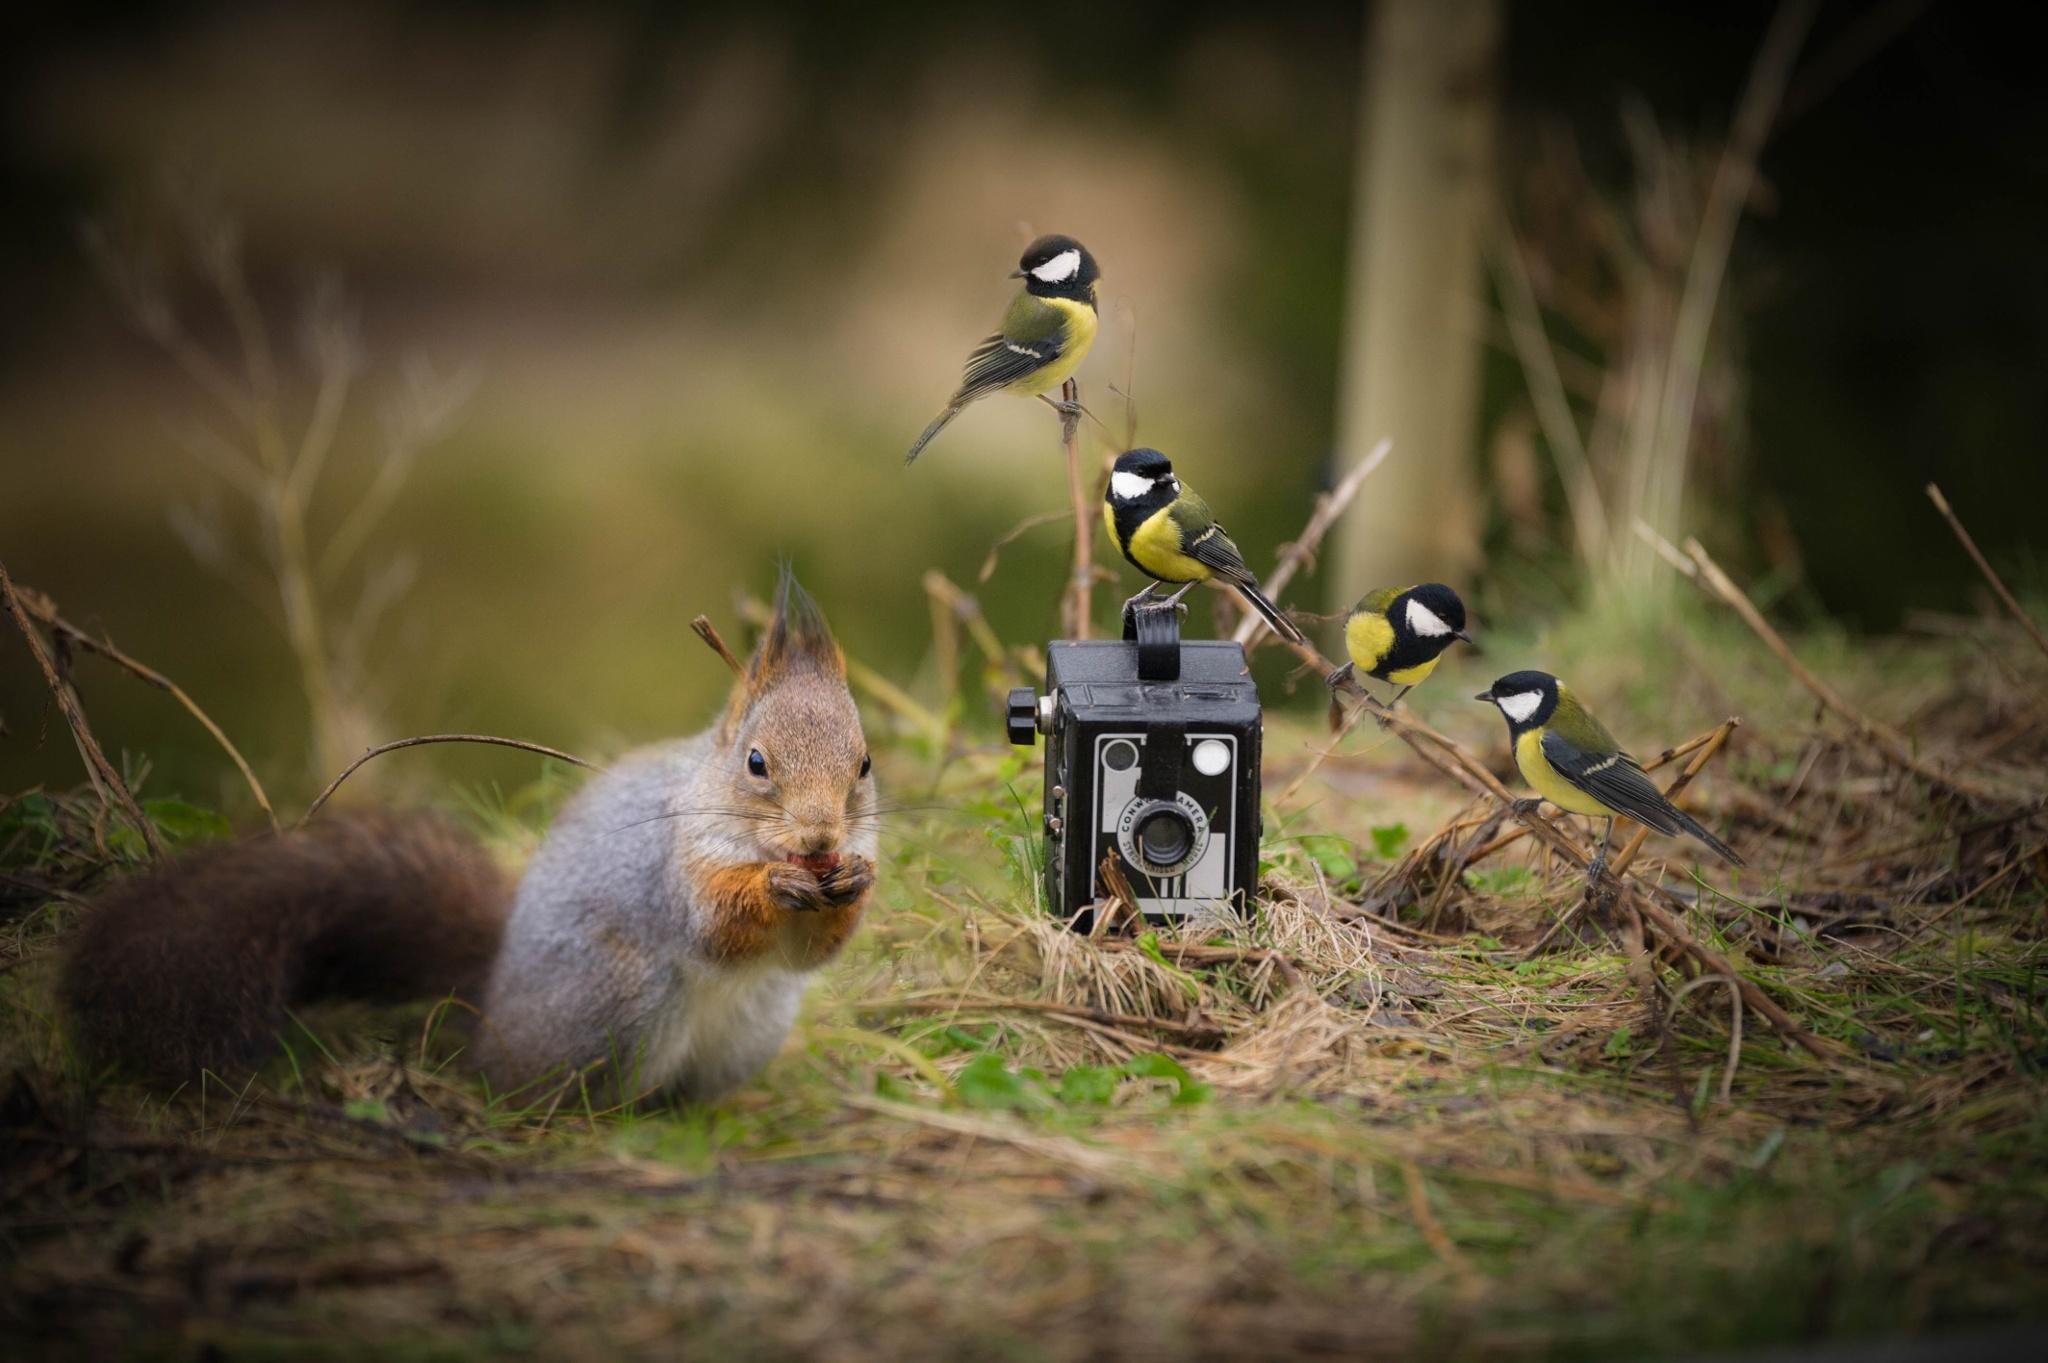 необходимо взгляд на птиц глазами фотографа самого большого